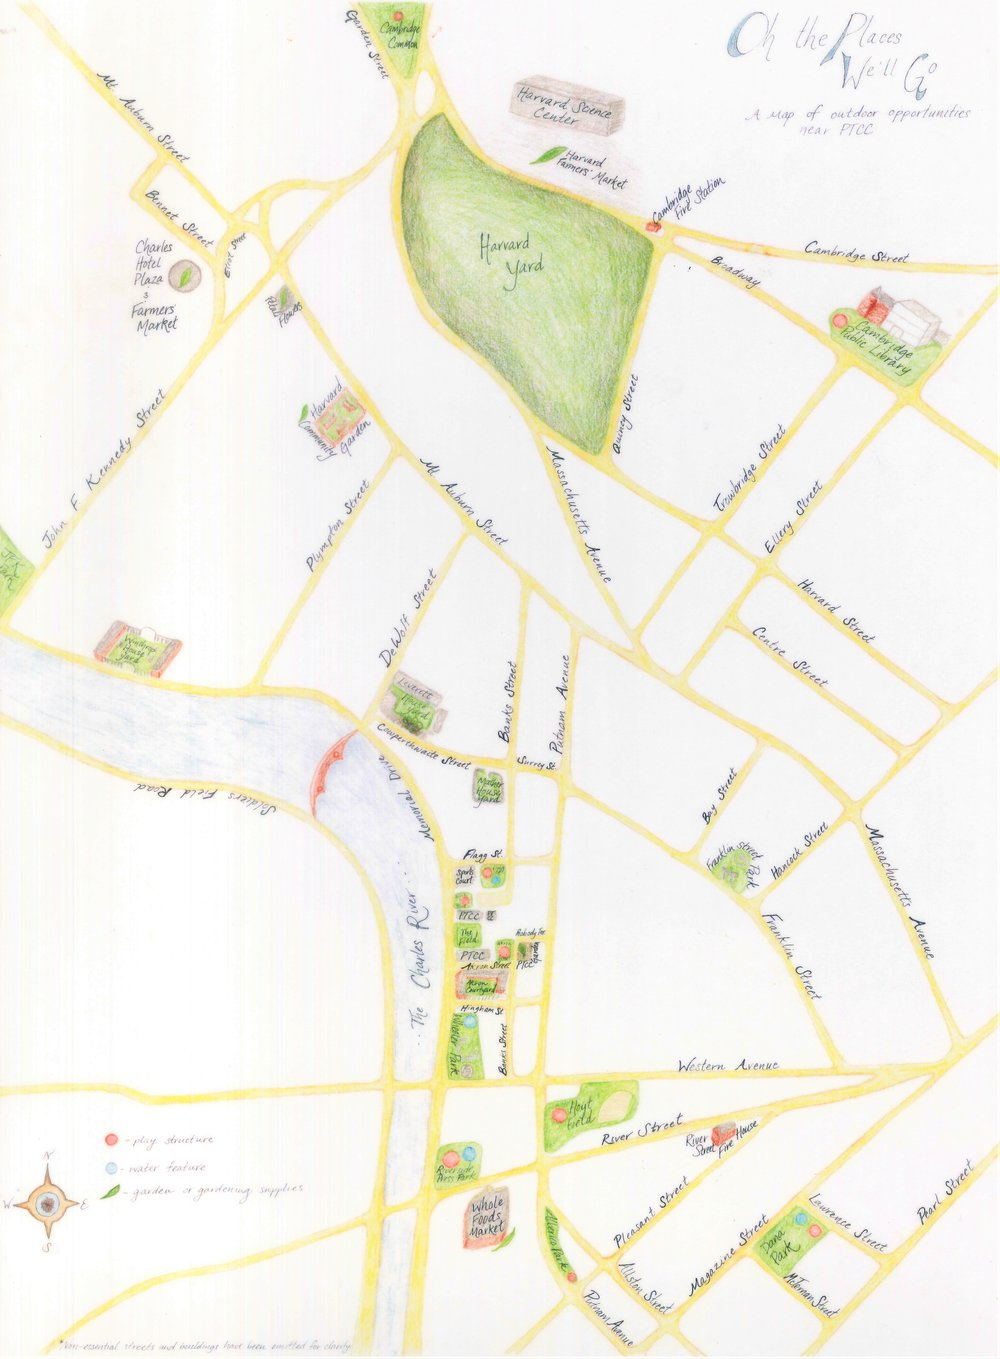 Cambridge Map.jpg